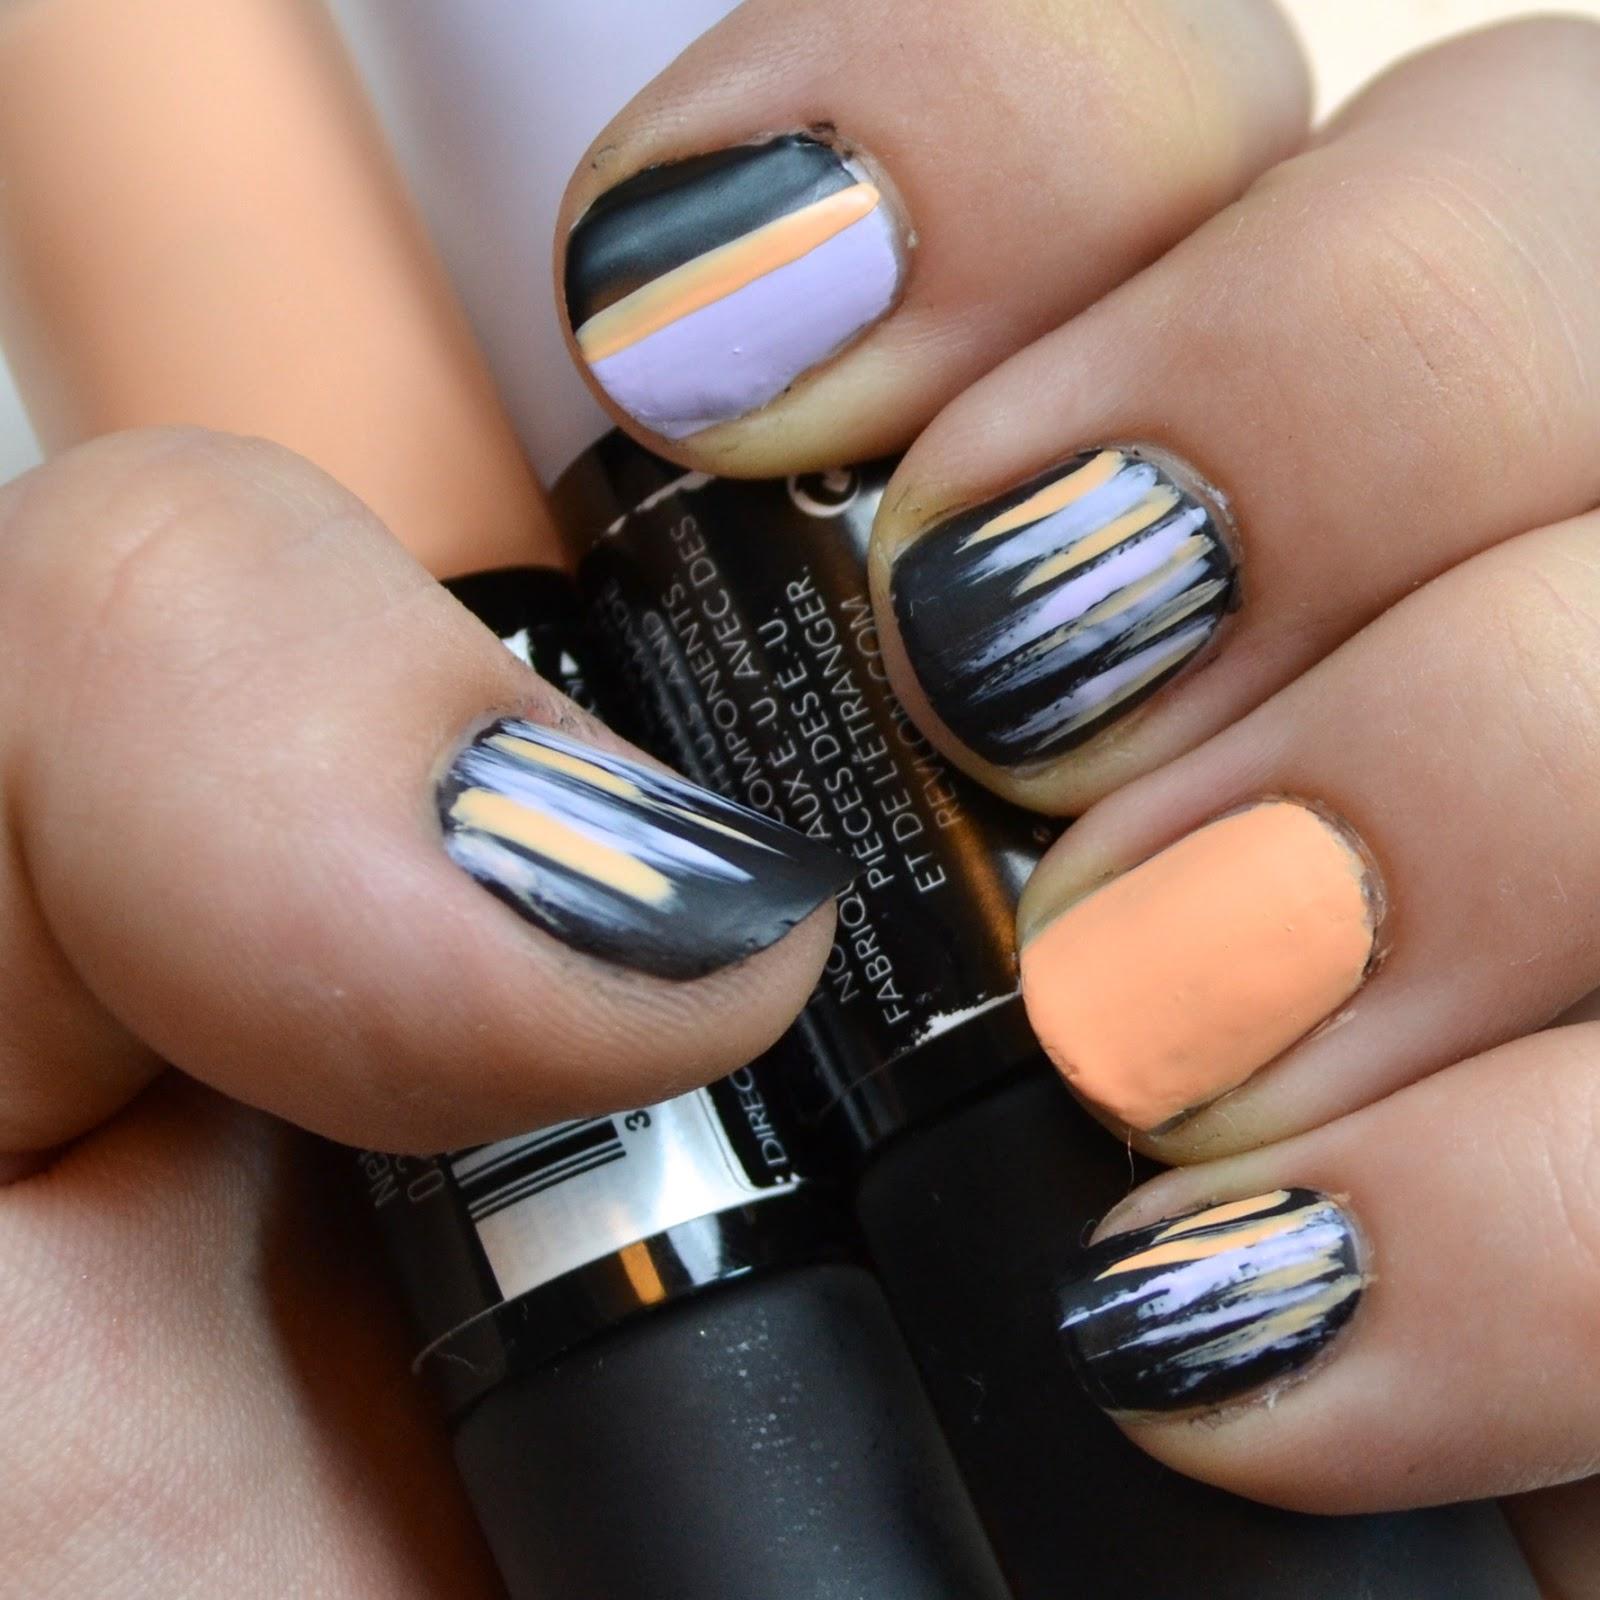 Revlon chalkboard nail polish   Hair & beauty   Pinterest ...